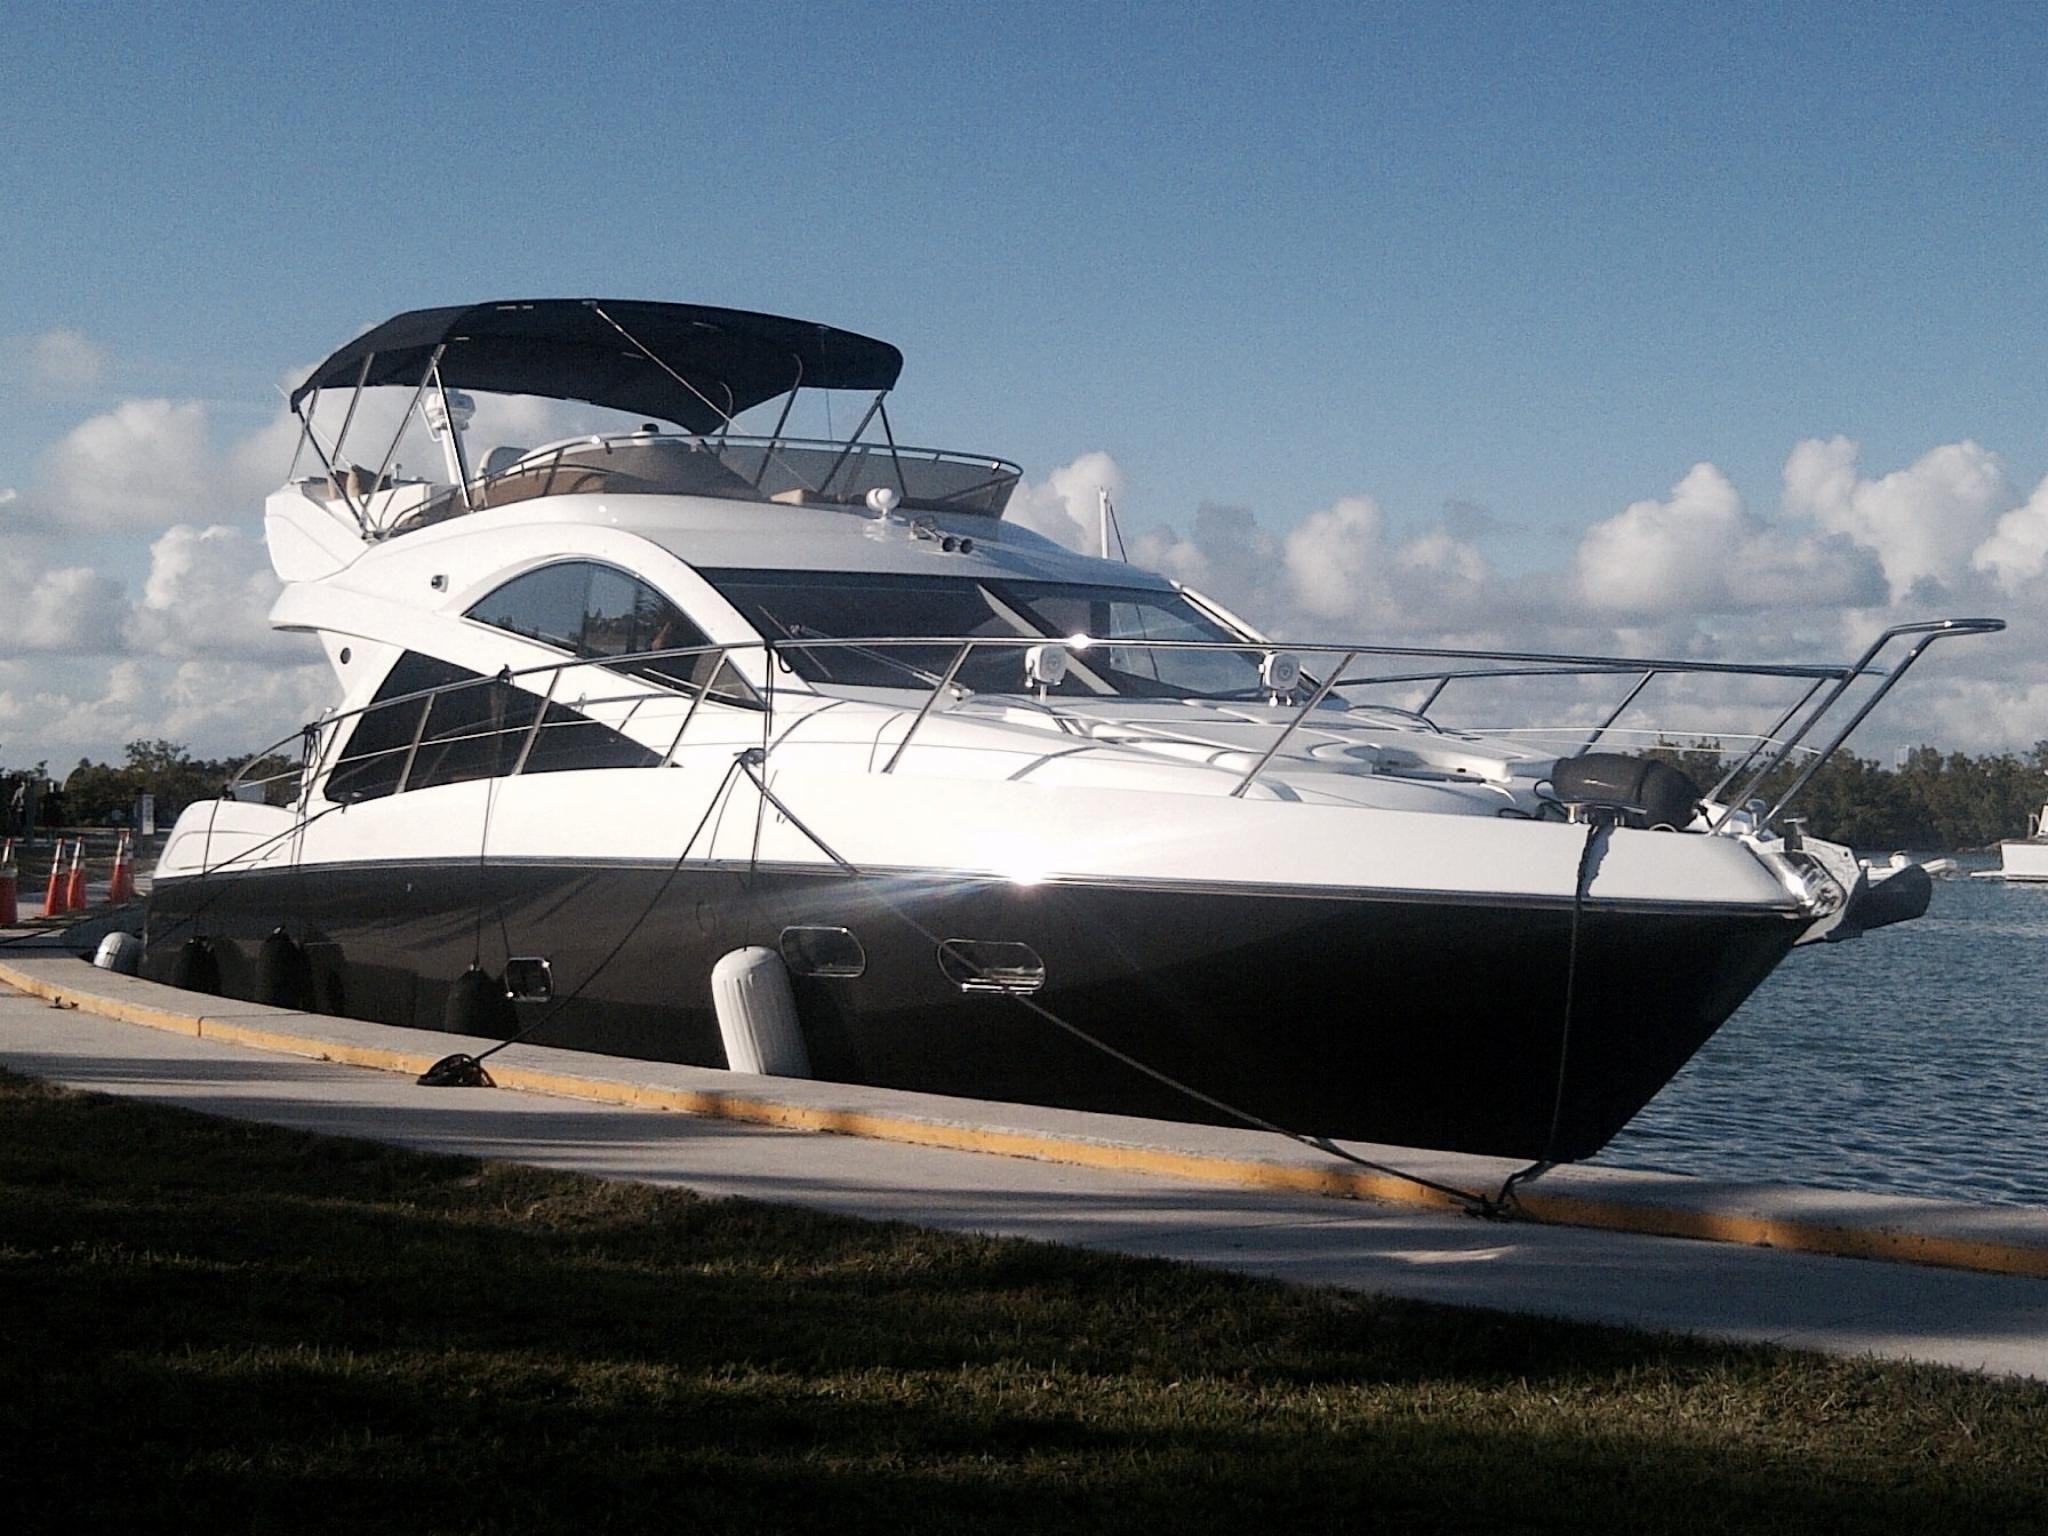 2012 Sunseeker Manhattan 53 Power Boat For Sale Www Yachtworld Com